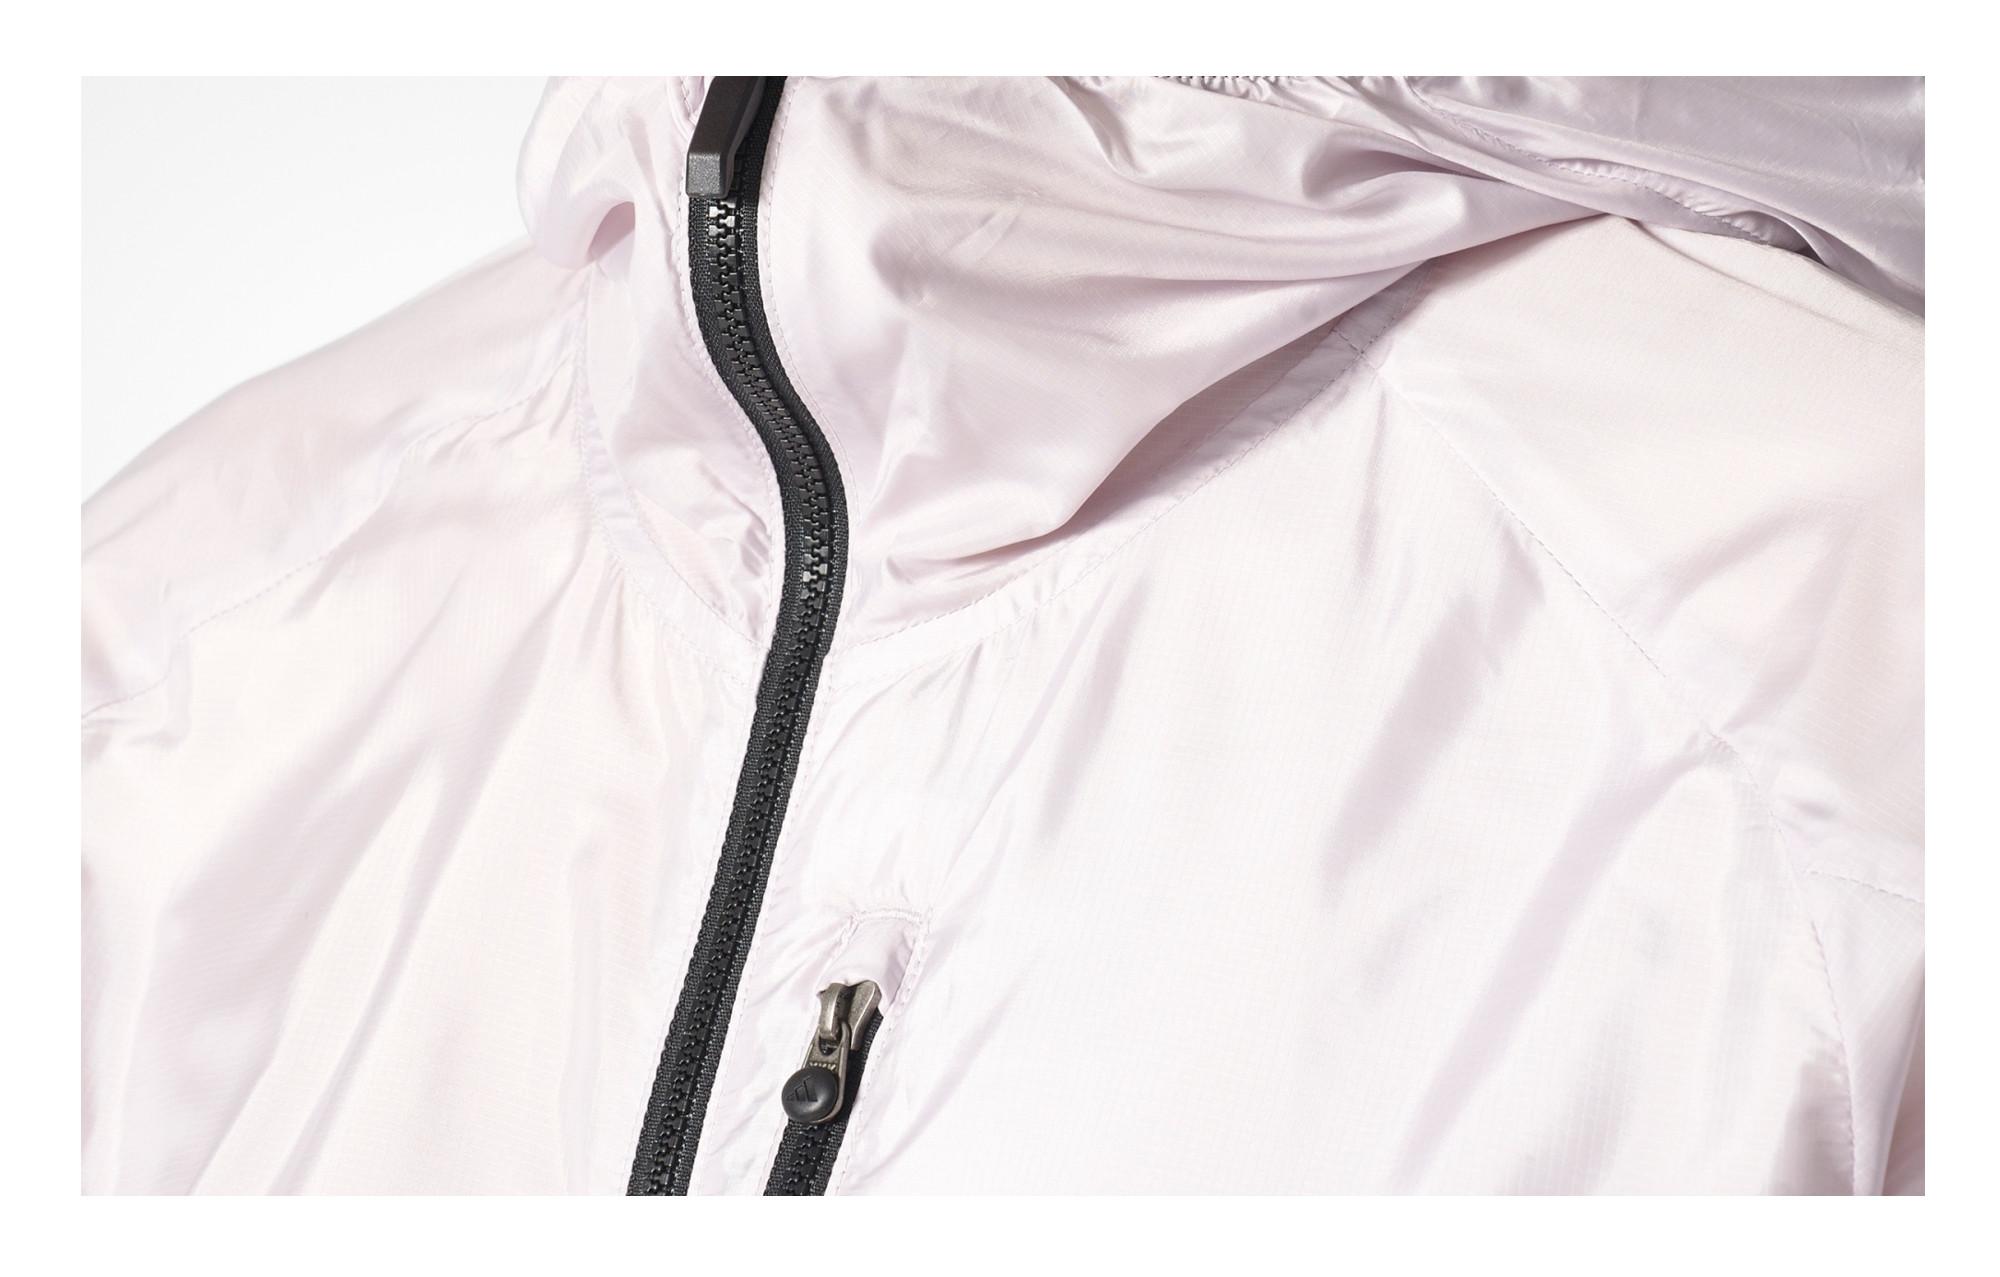 Veste Coupe Vent Imperméable Femme adidas running Terrex Agravic Blanc Violet